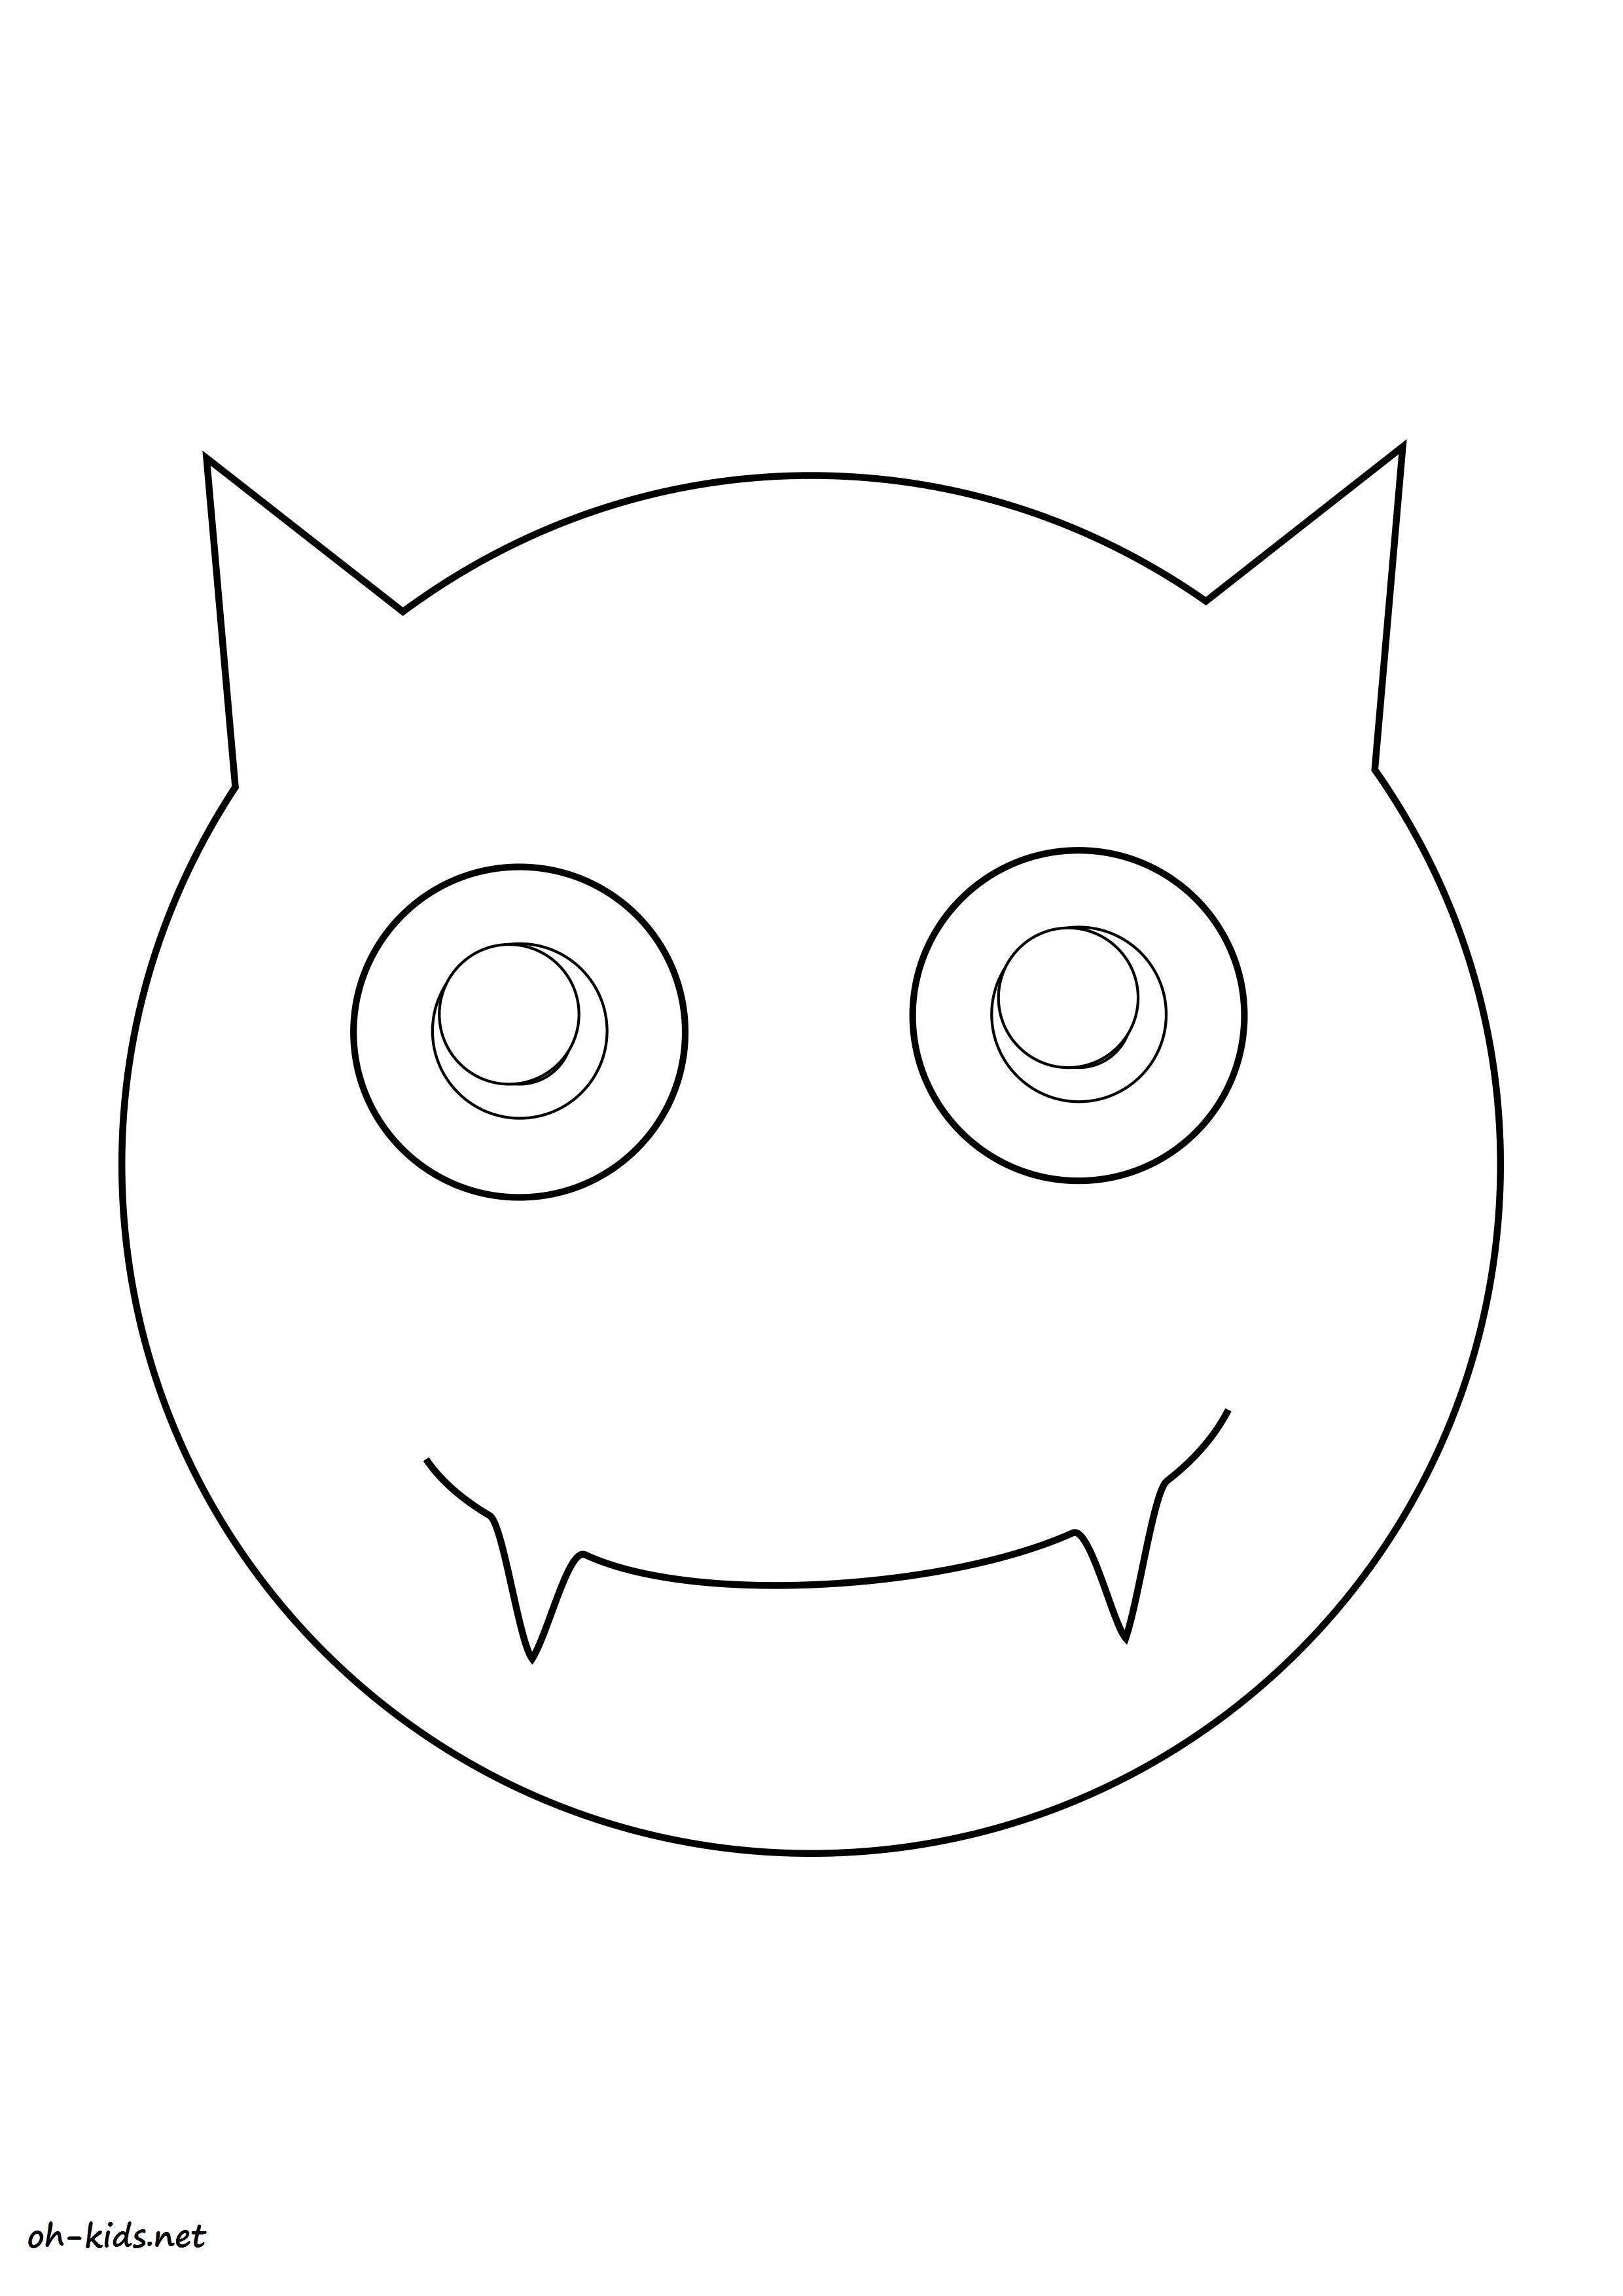 Dessin 768 Coloriage Smiley A Imprimer Oh Kids Net